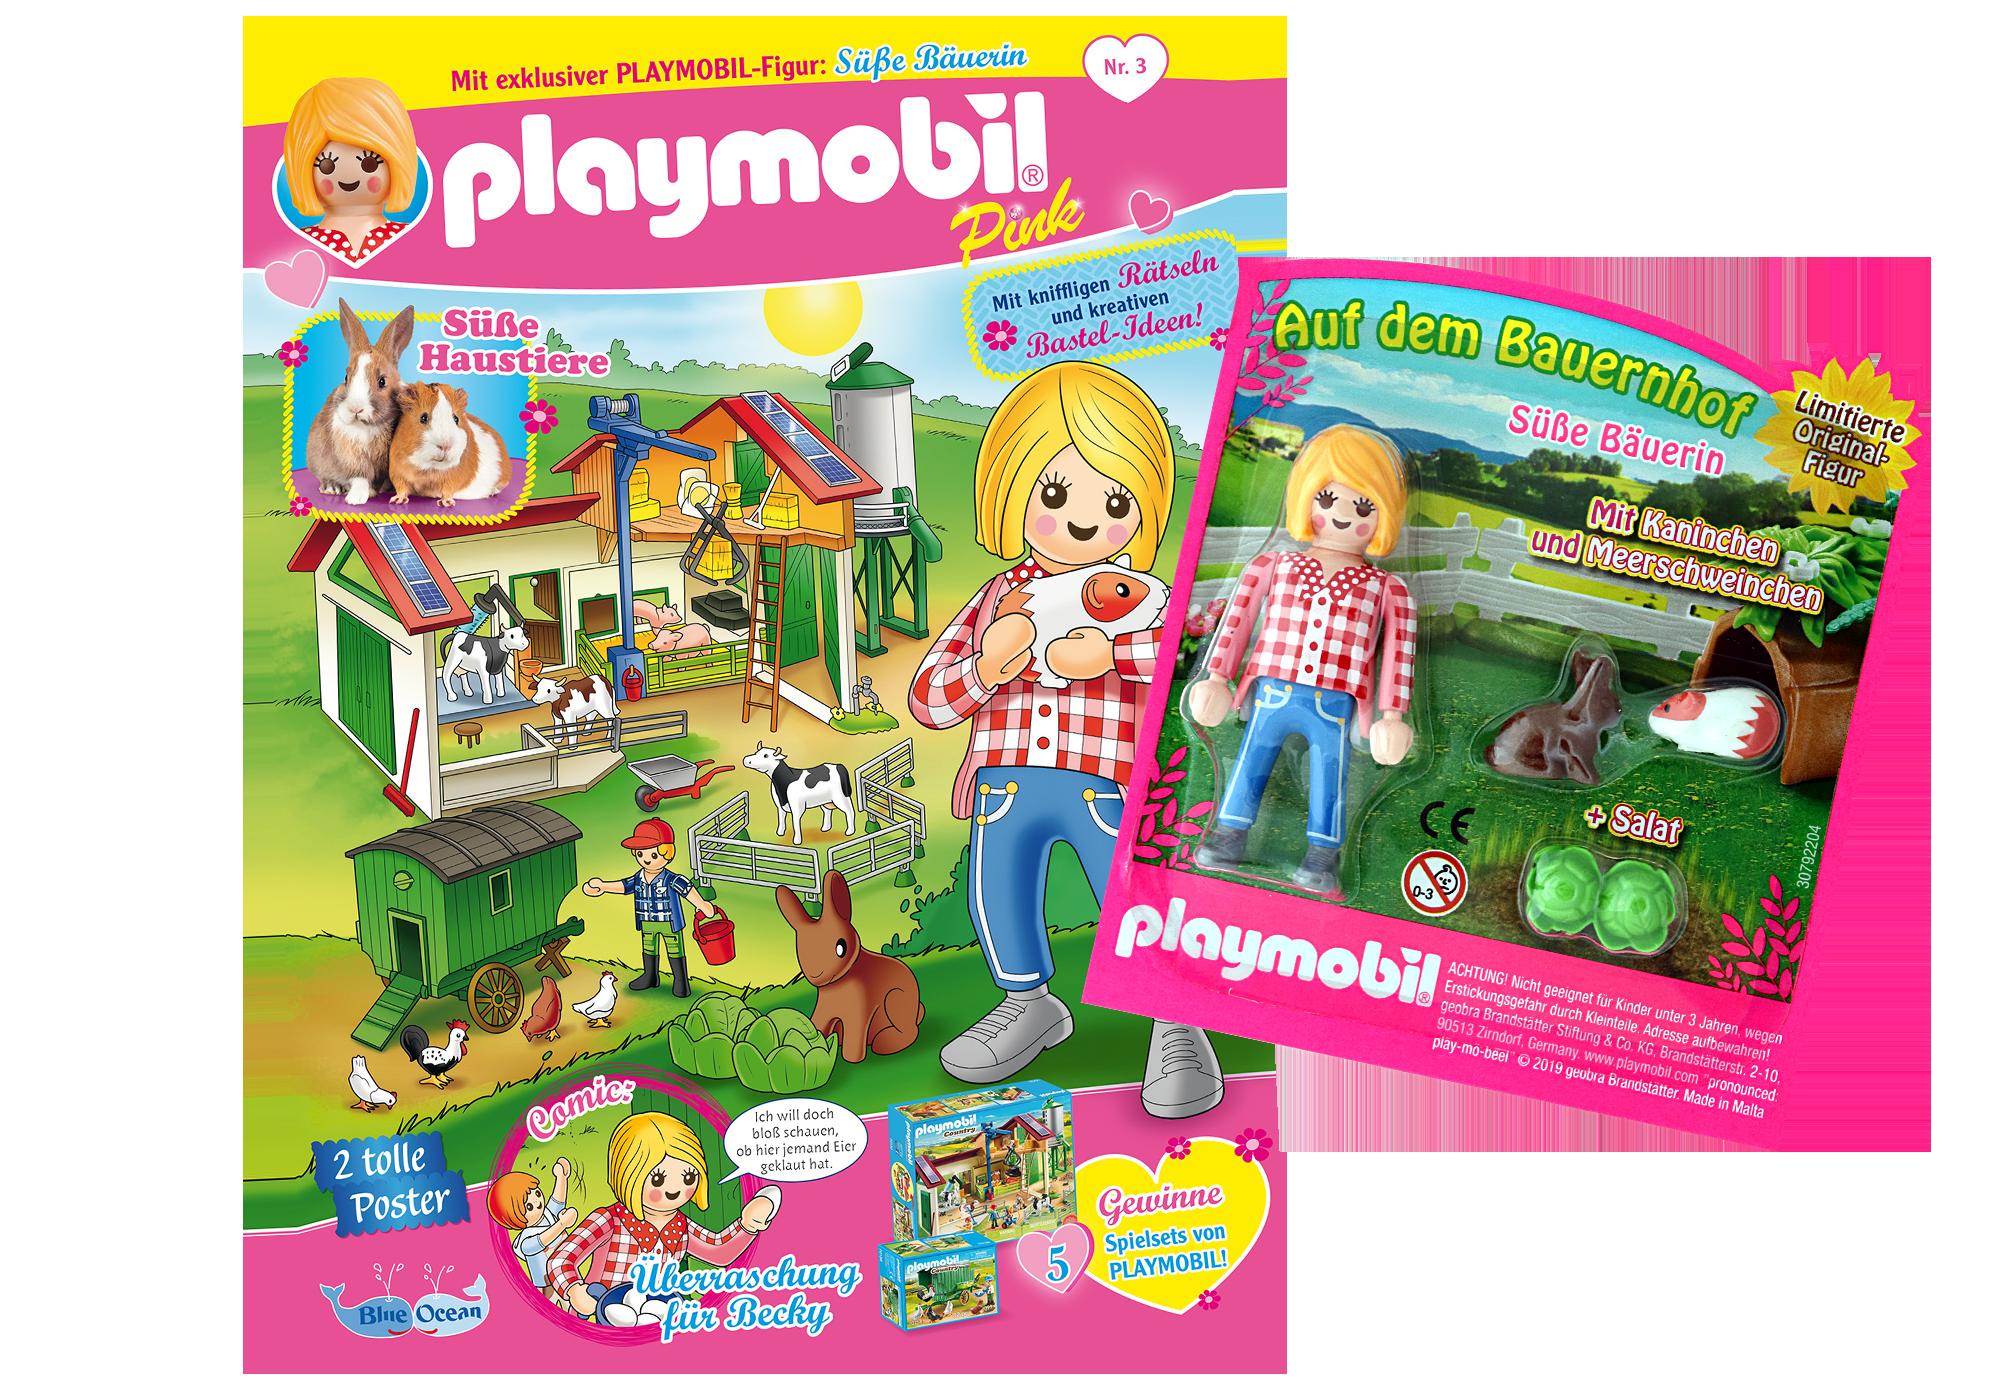 http://media.playmobil.com/i/playmobil/80625_product_detail/PLAYMOBIL-Magazin Pink 3/2019 (Heft 43)